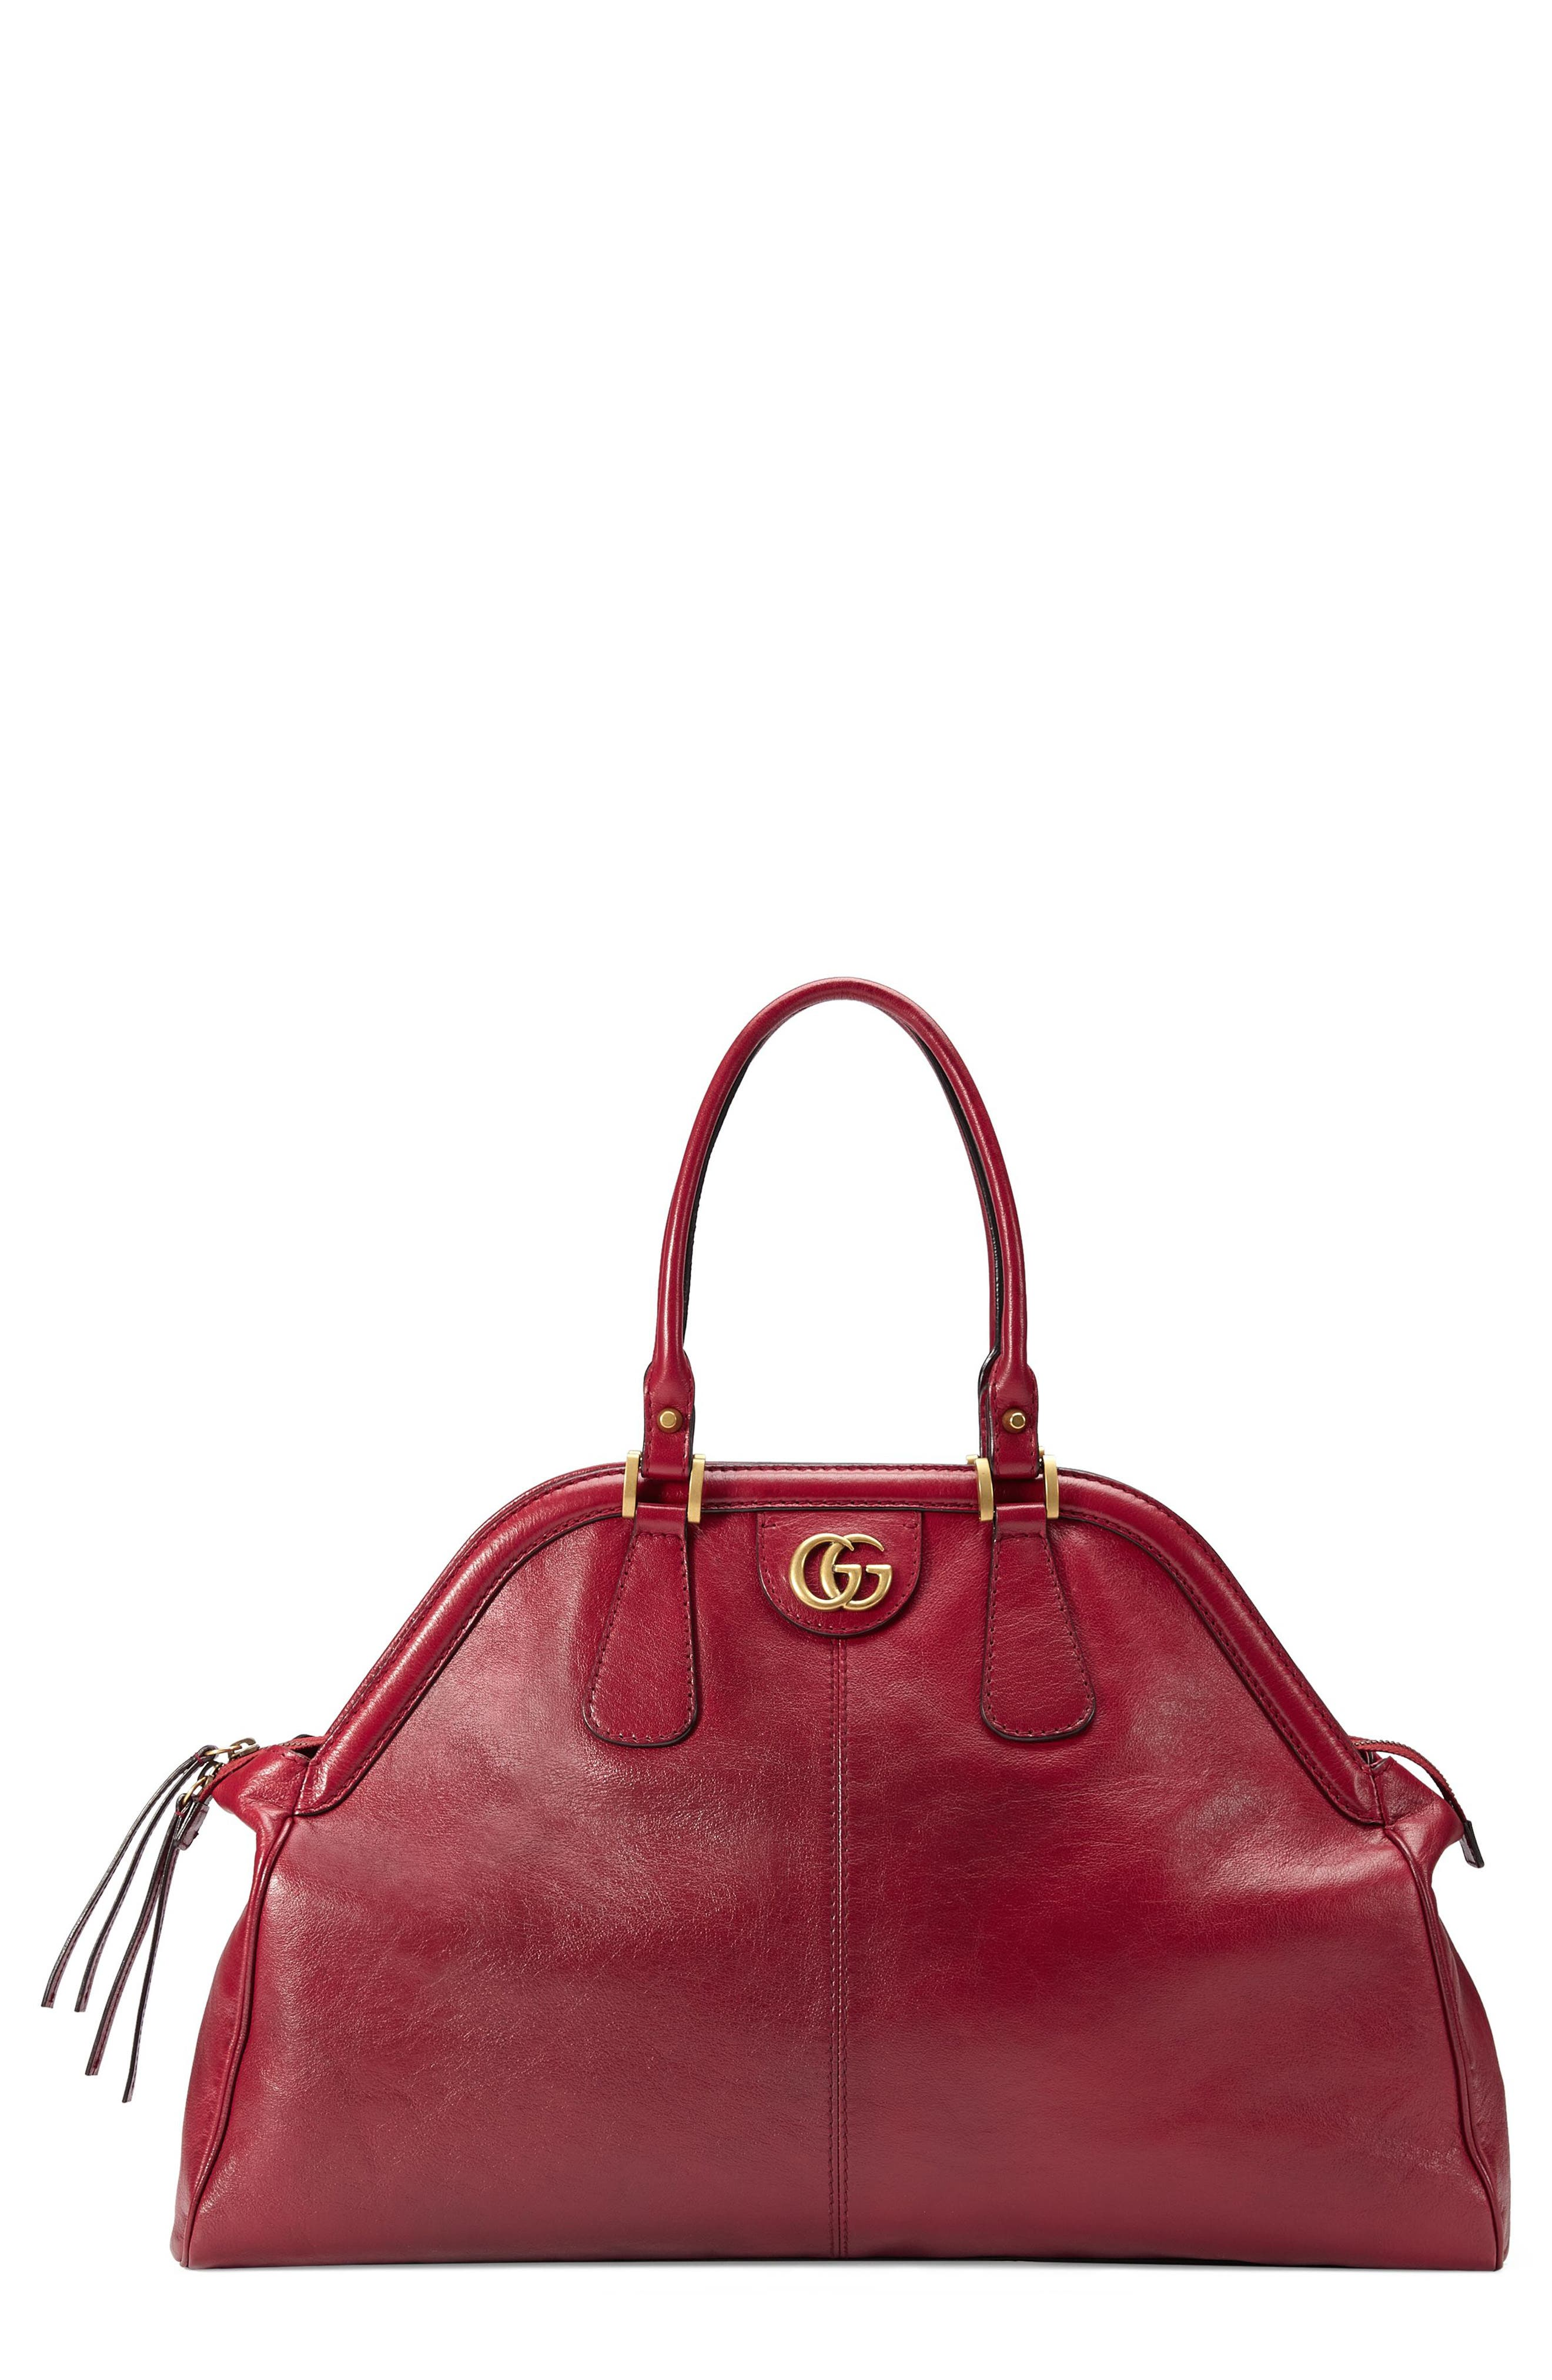 Gucci Large RE(BELLE) Leather Satchel